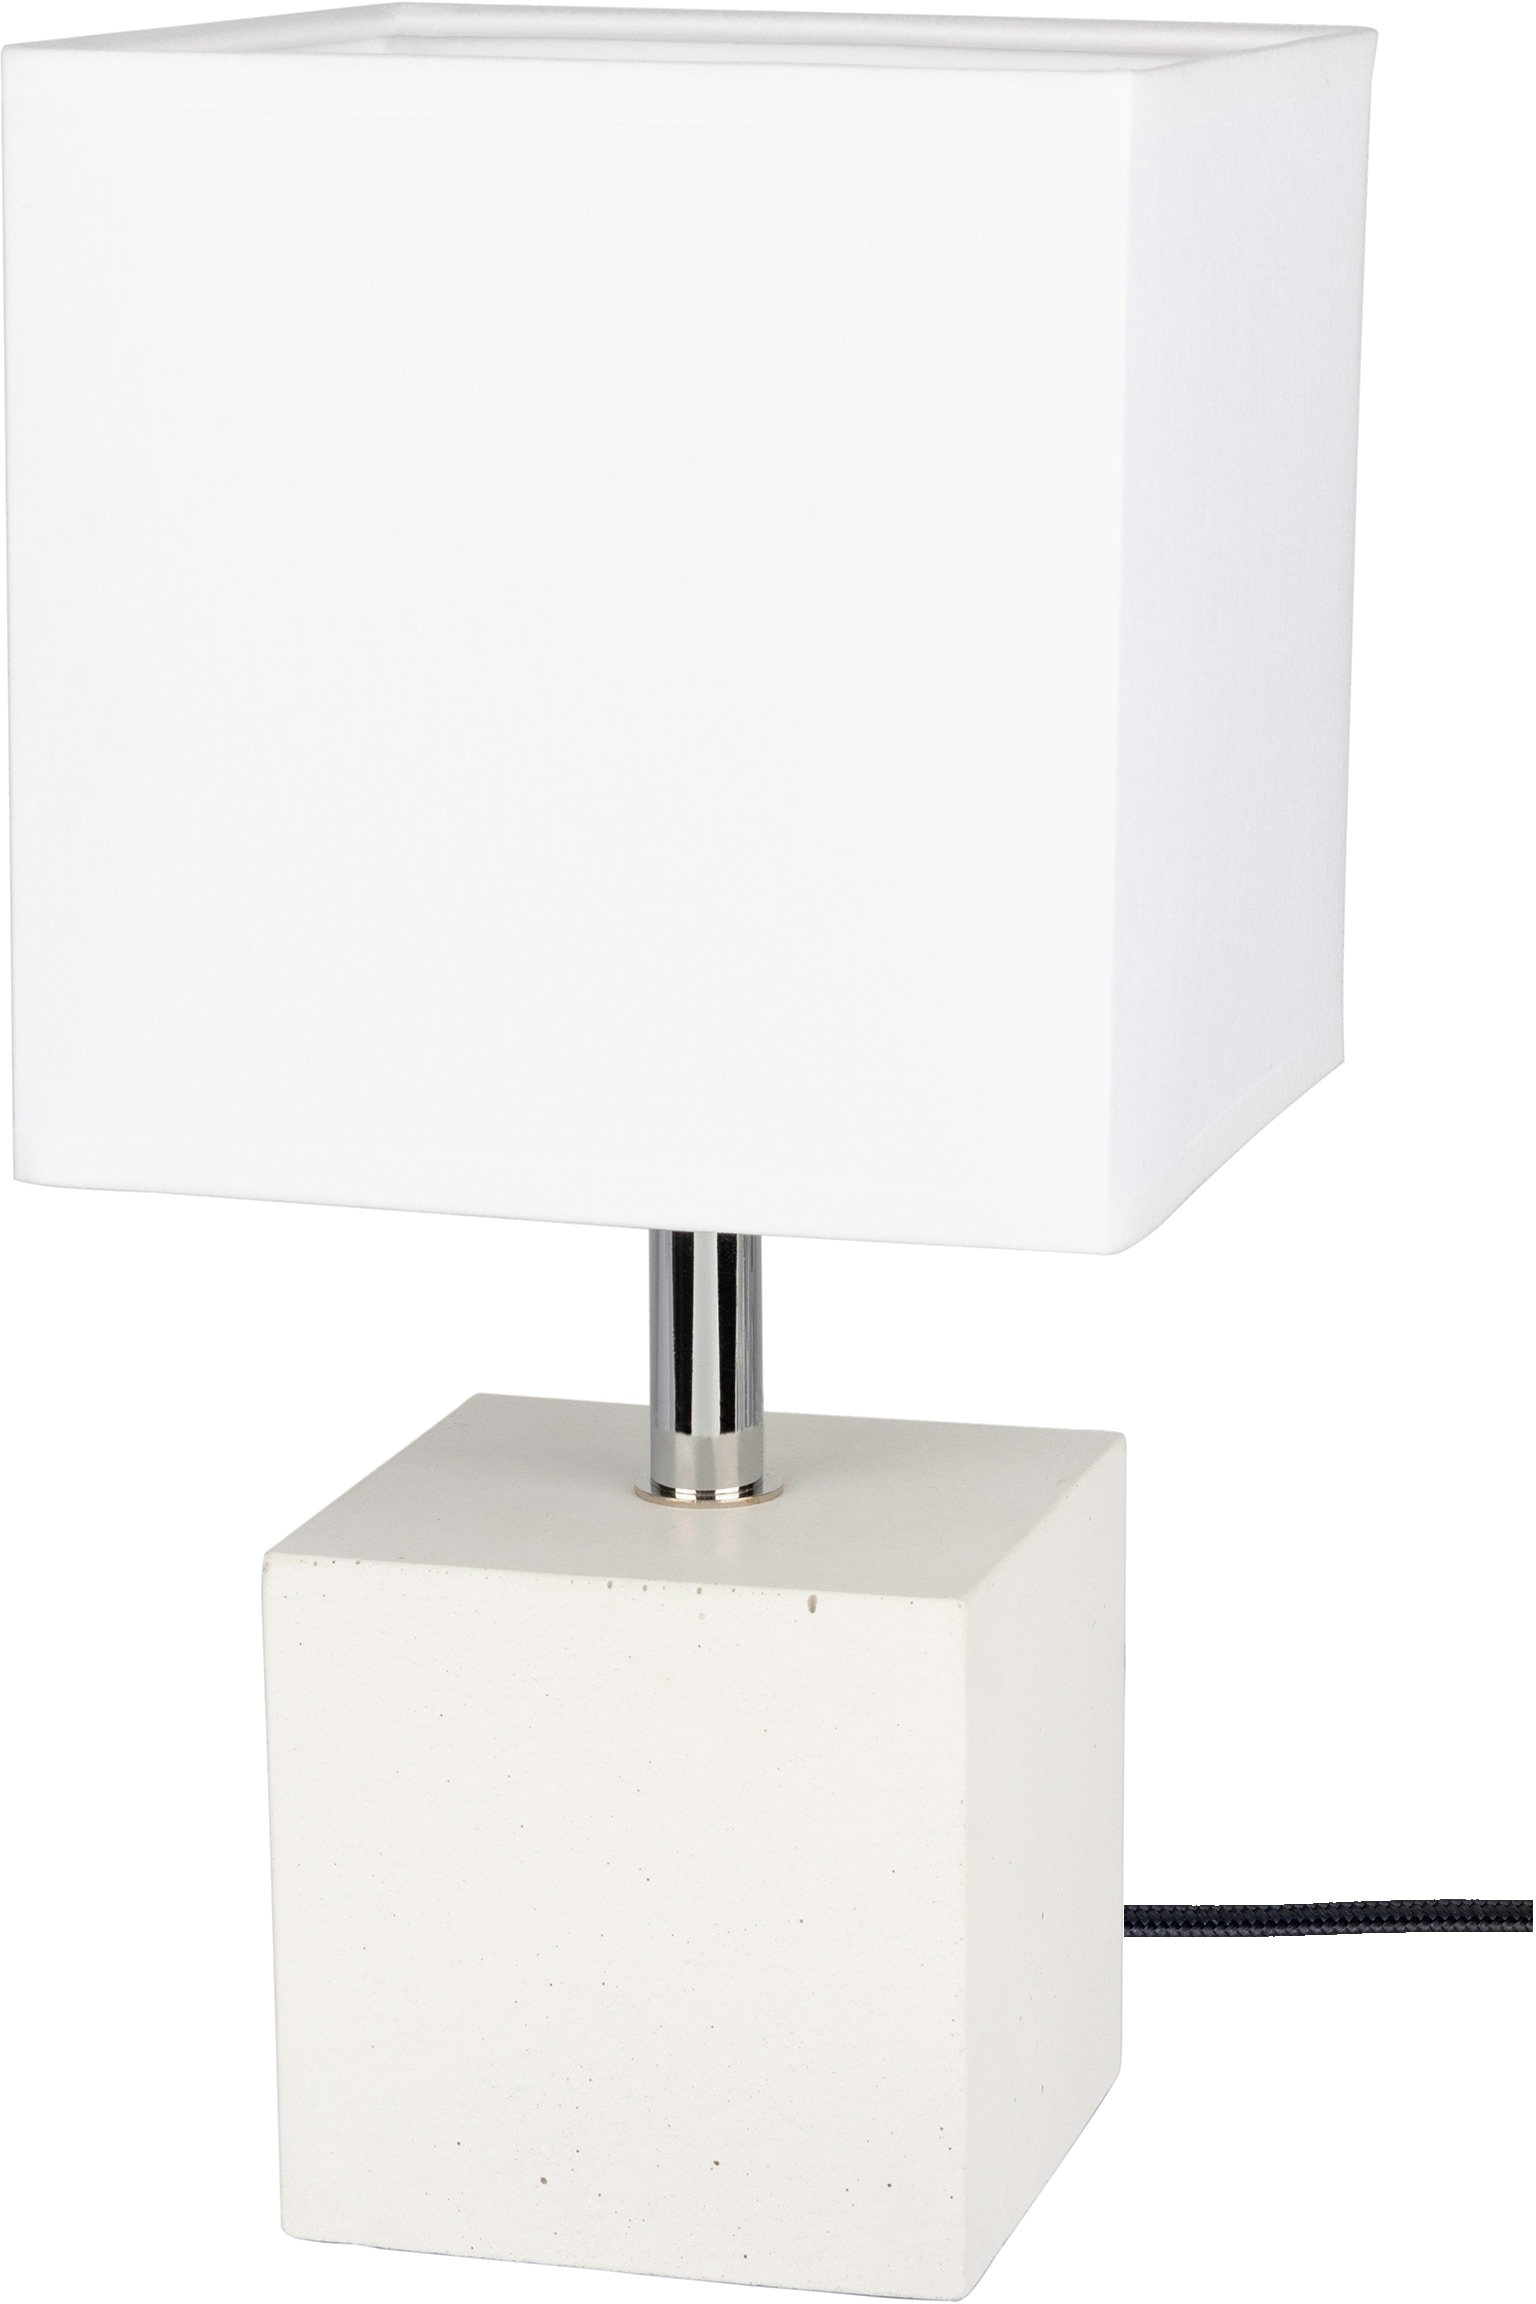 SPOT Light Tischleuchte STRONG, E27, 1 St., Basis aus weißem Beton, Textilschirm, Naturprodukt - Nachhaltig, Made in EU